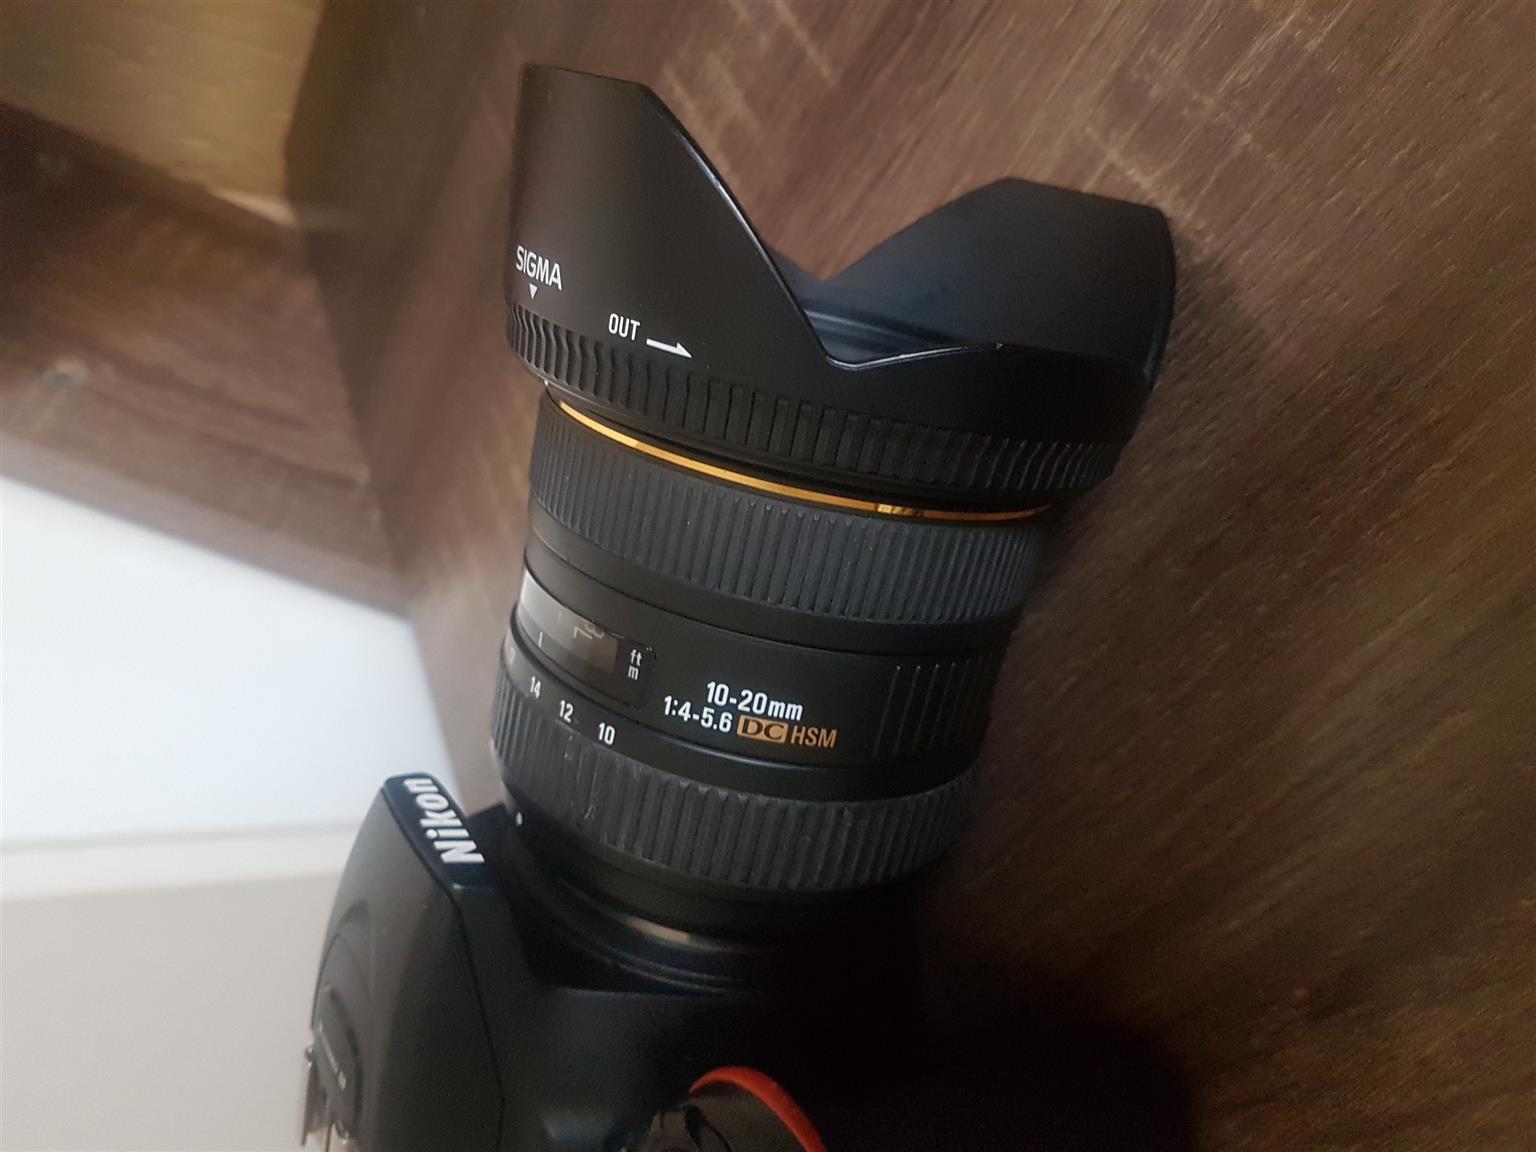 Sigma 10-20mm F/4-5.6 lens for Nikon F Mount